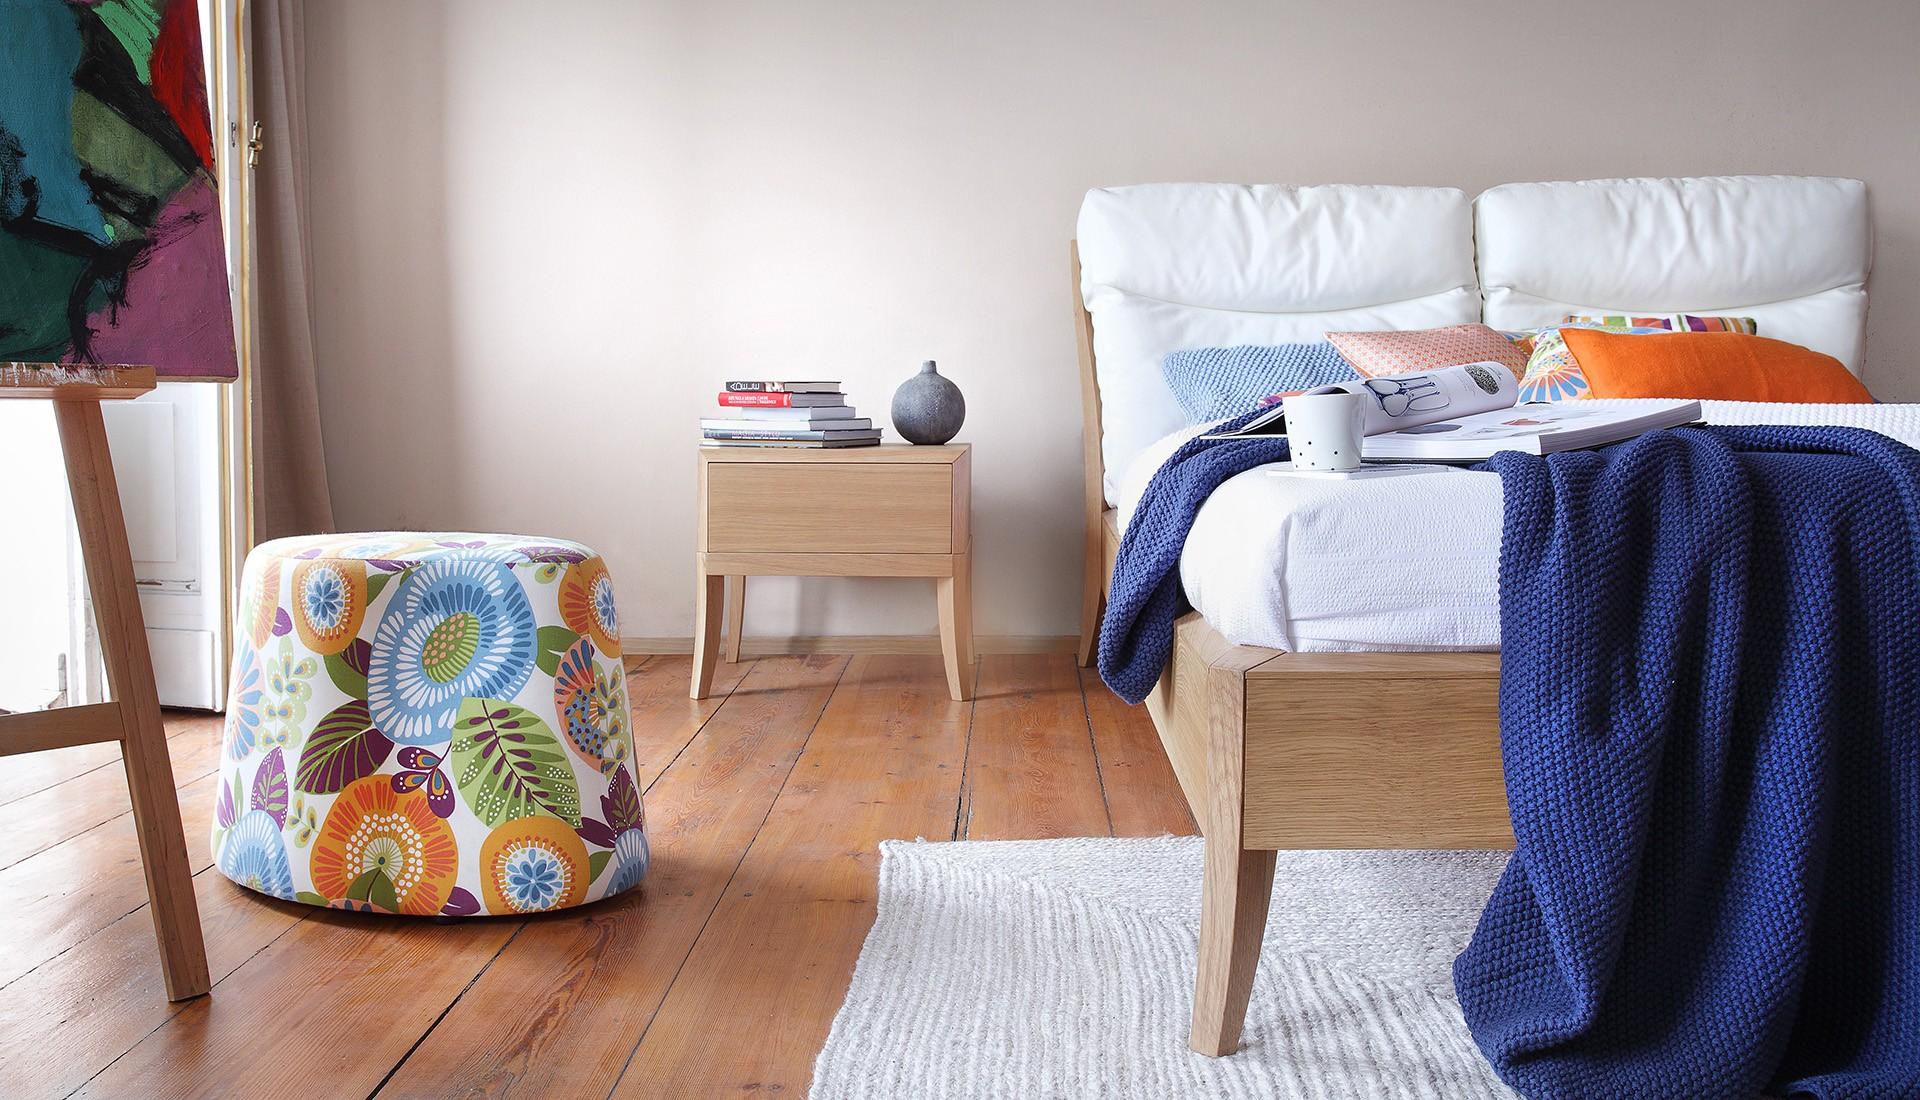 test3 Спальня Dream (Swarzedz Home, Польша) Фото 10